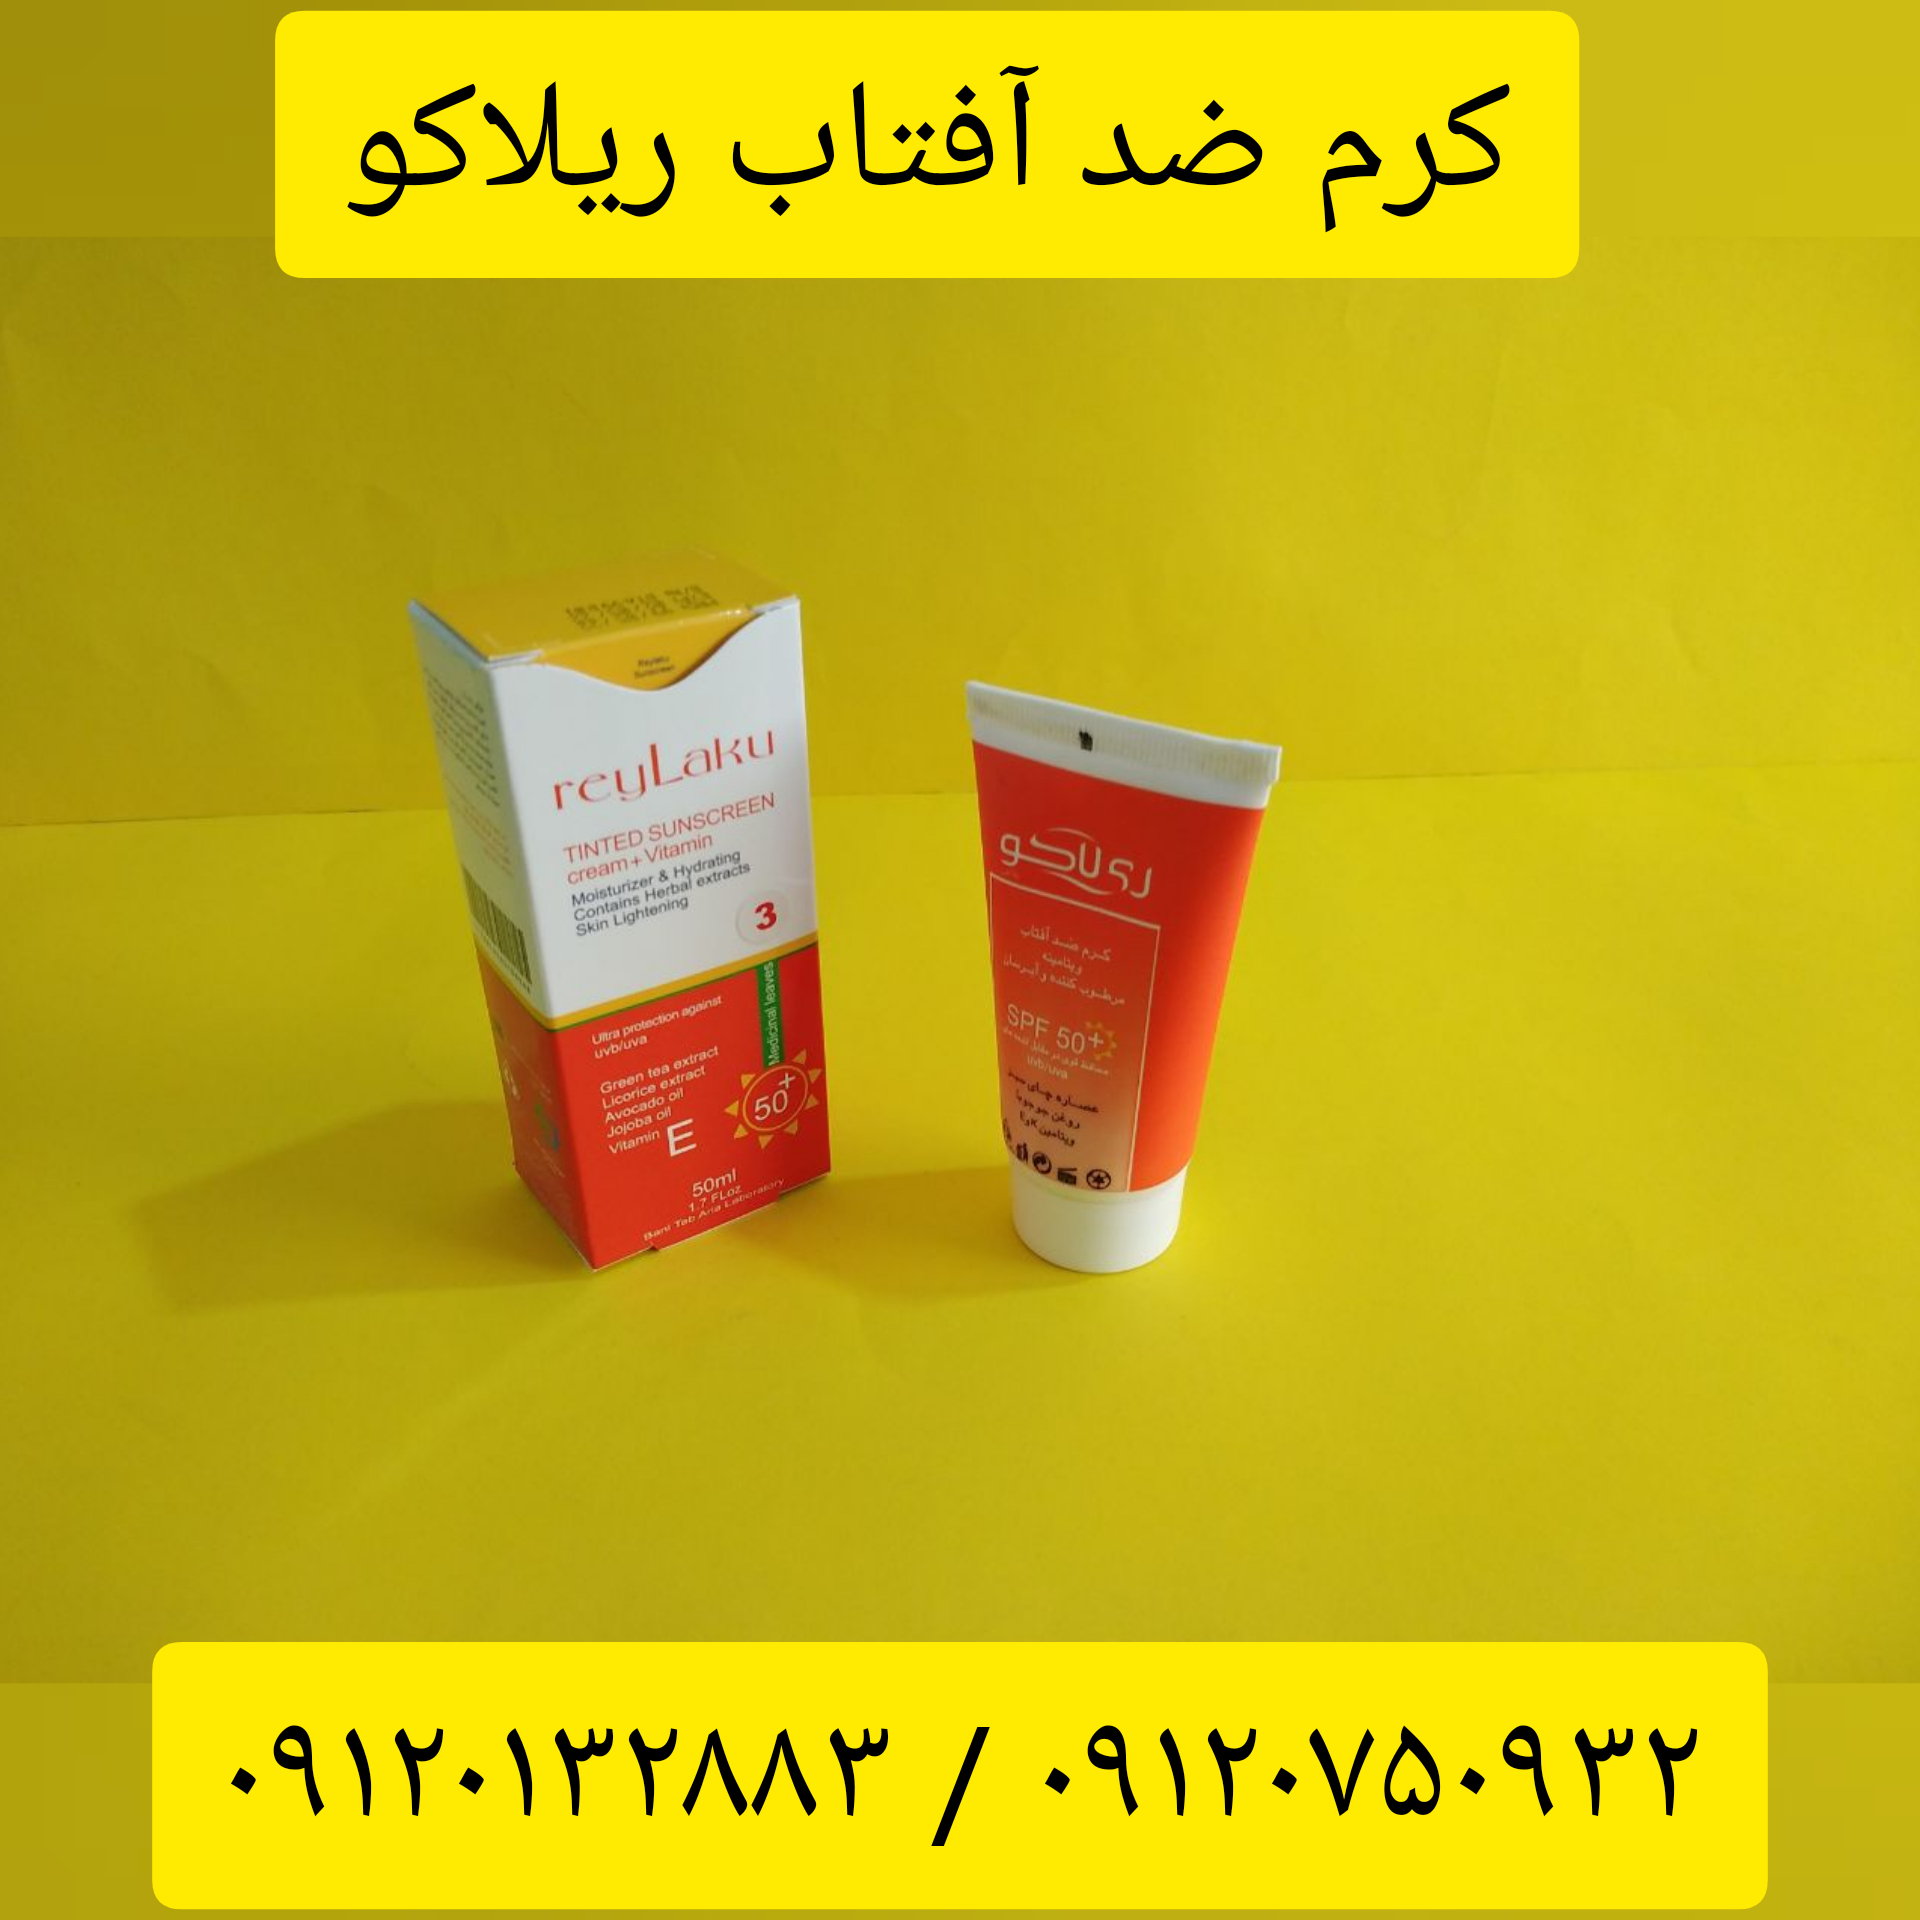 کرم ضد آفتاب ریلاکو /۰۹۱۲۰۱۳۲۸۸۳/کرم ضد آفتاب ویتامینه